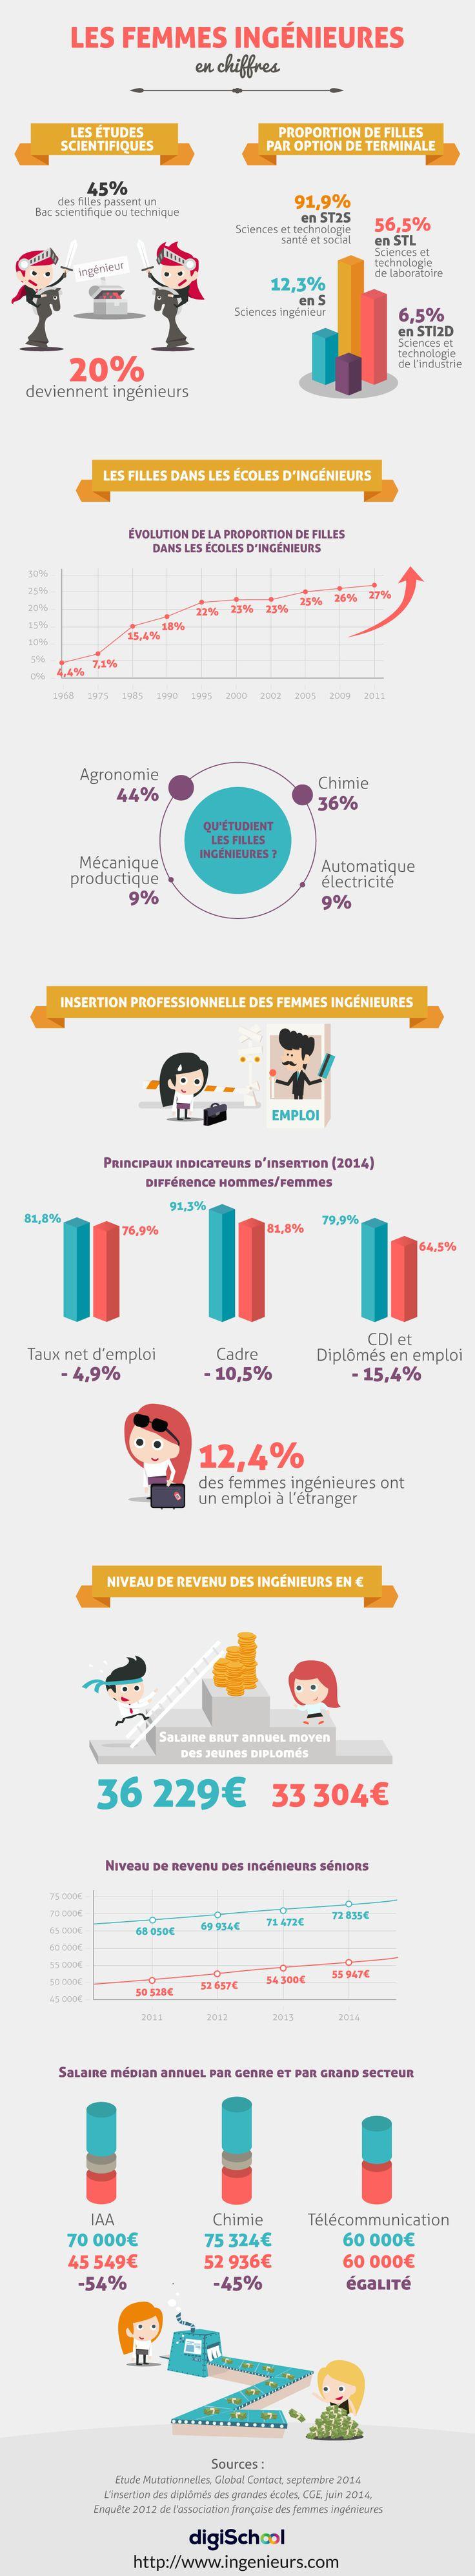 Infographie Femmes Ingénieures